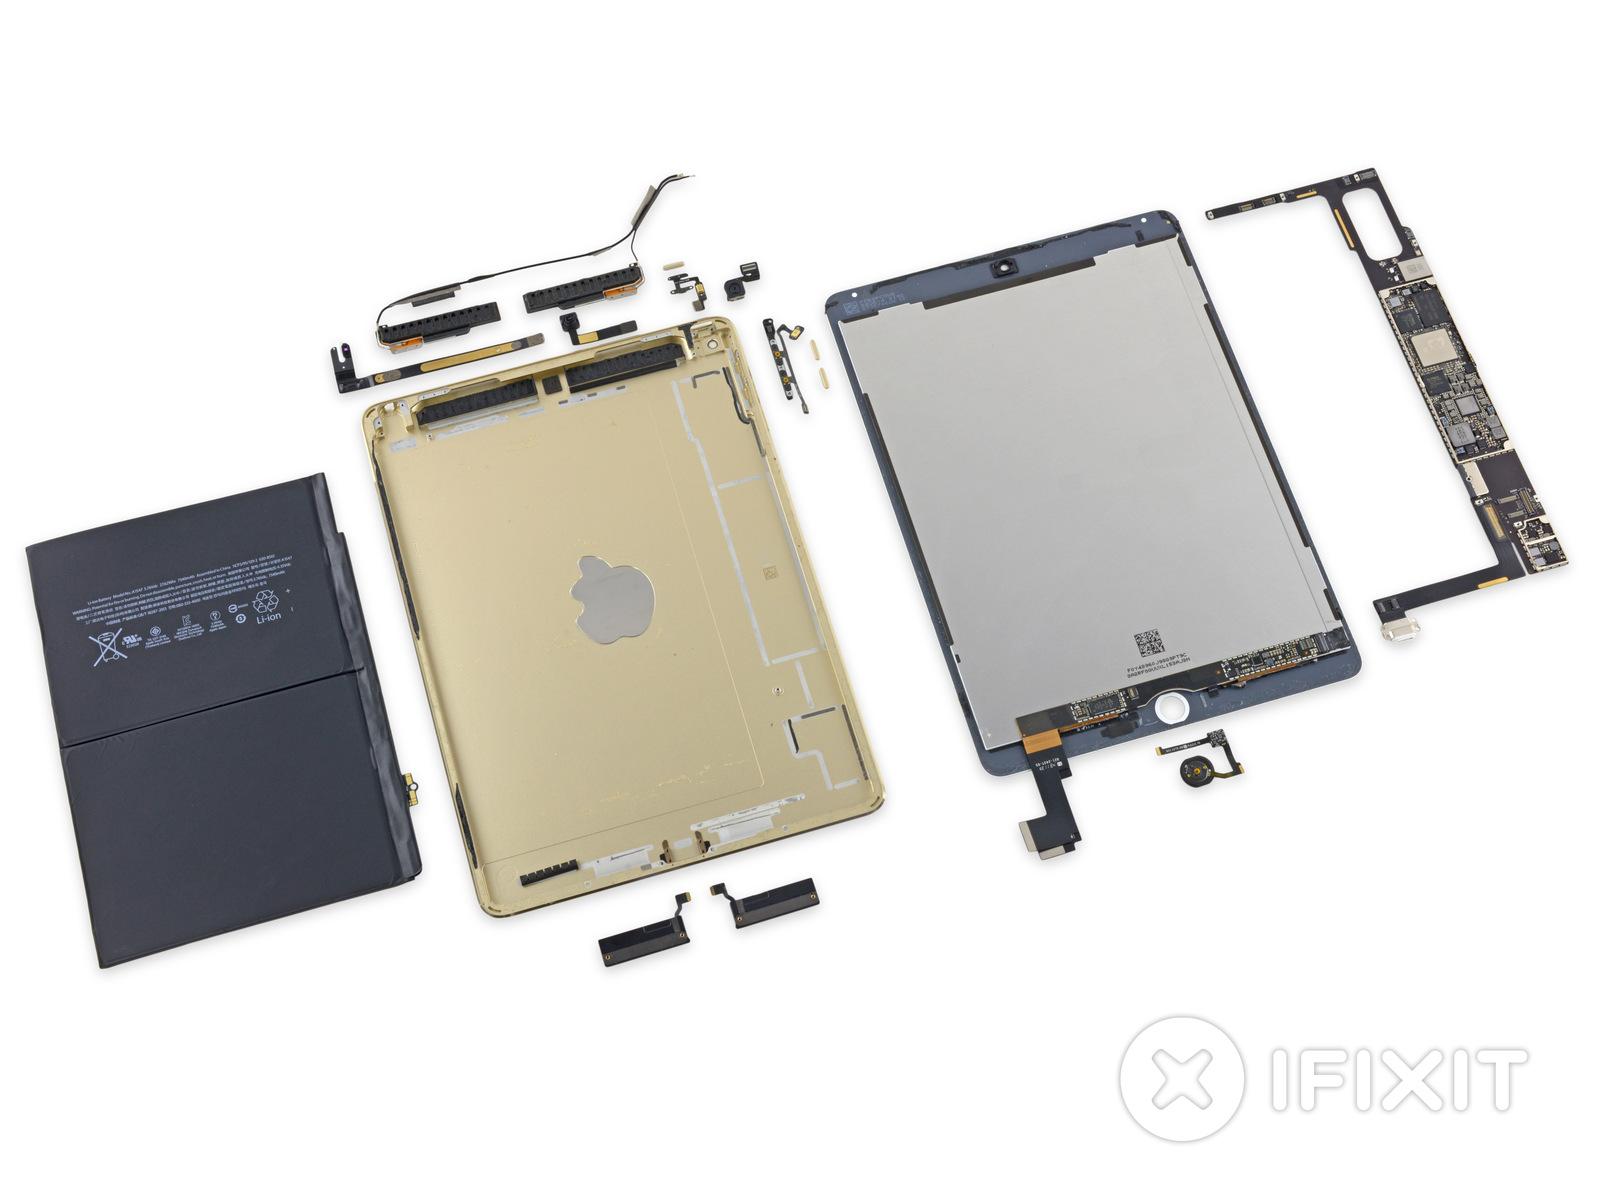 test apple ipad air 2 a1567 128 gb lte tablet tests. Black Bedroom Furniture Sets. Home Design Ideas